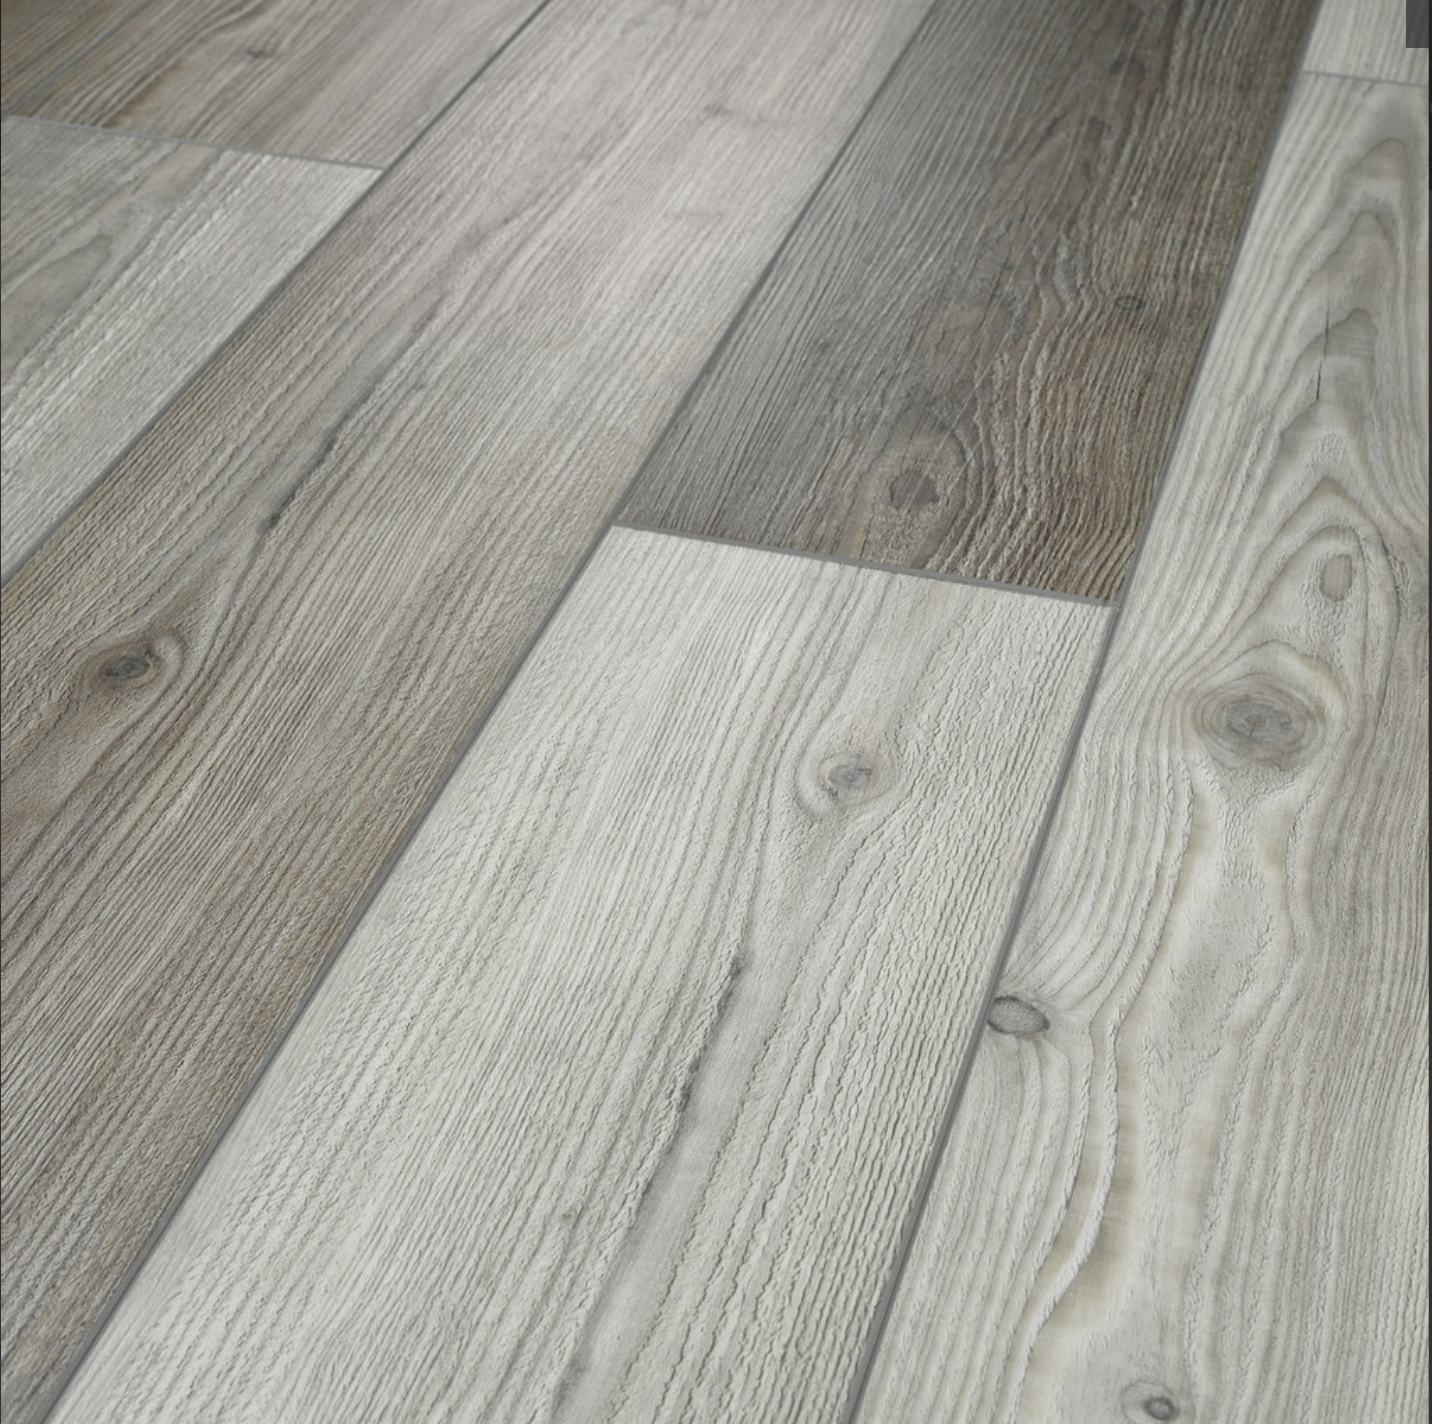 Wood Floors Plus Discontinued, Discontinued Shaw Laminate Flooring